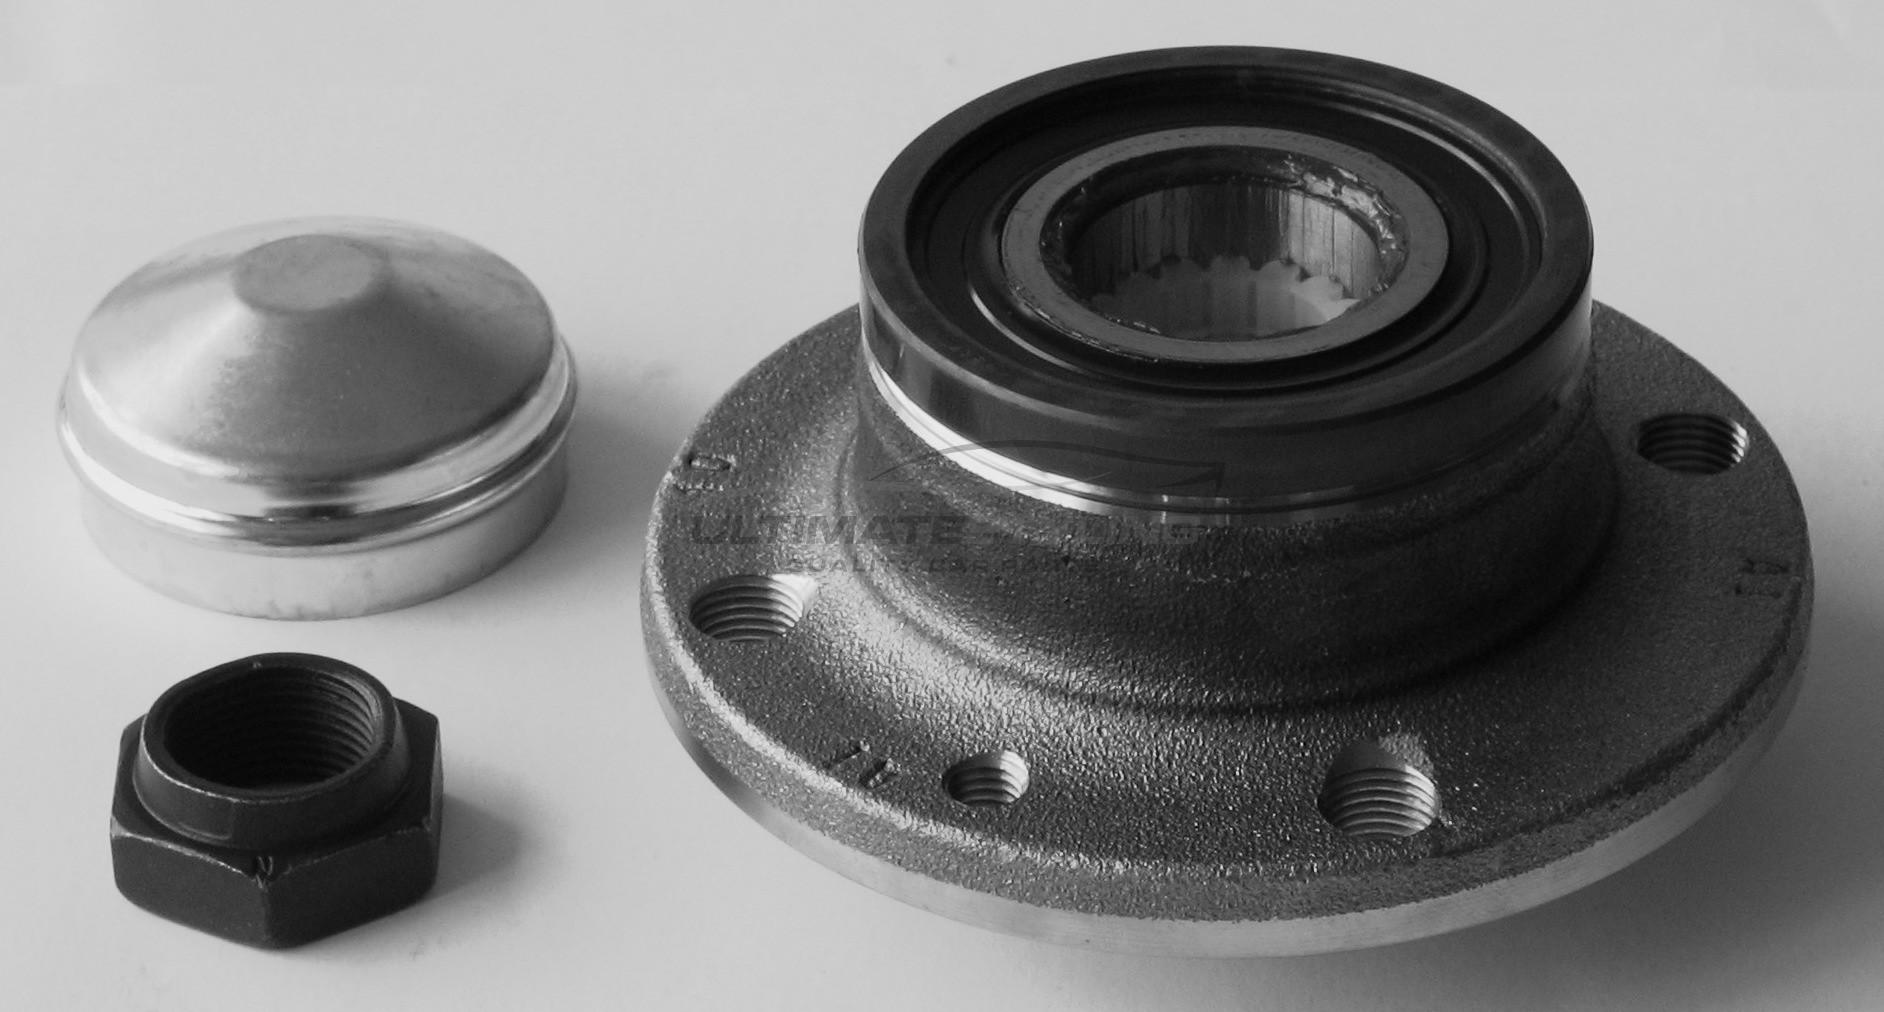 Hub Bearing Kit - Rear for Abarth 500 / 595 / 695, Alfa Romeo 145 / 146 / MiTo, Chrysler Delta / Ypsilon, Citroen Nemo, Fiat 500 / Brava / Bravo / Fiorino / Idea / Marea / Multipla / Panda / Punto / Qubo / Stilo, Ford Ka, Peugeot  and others